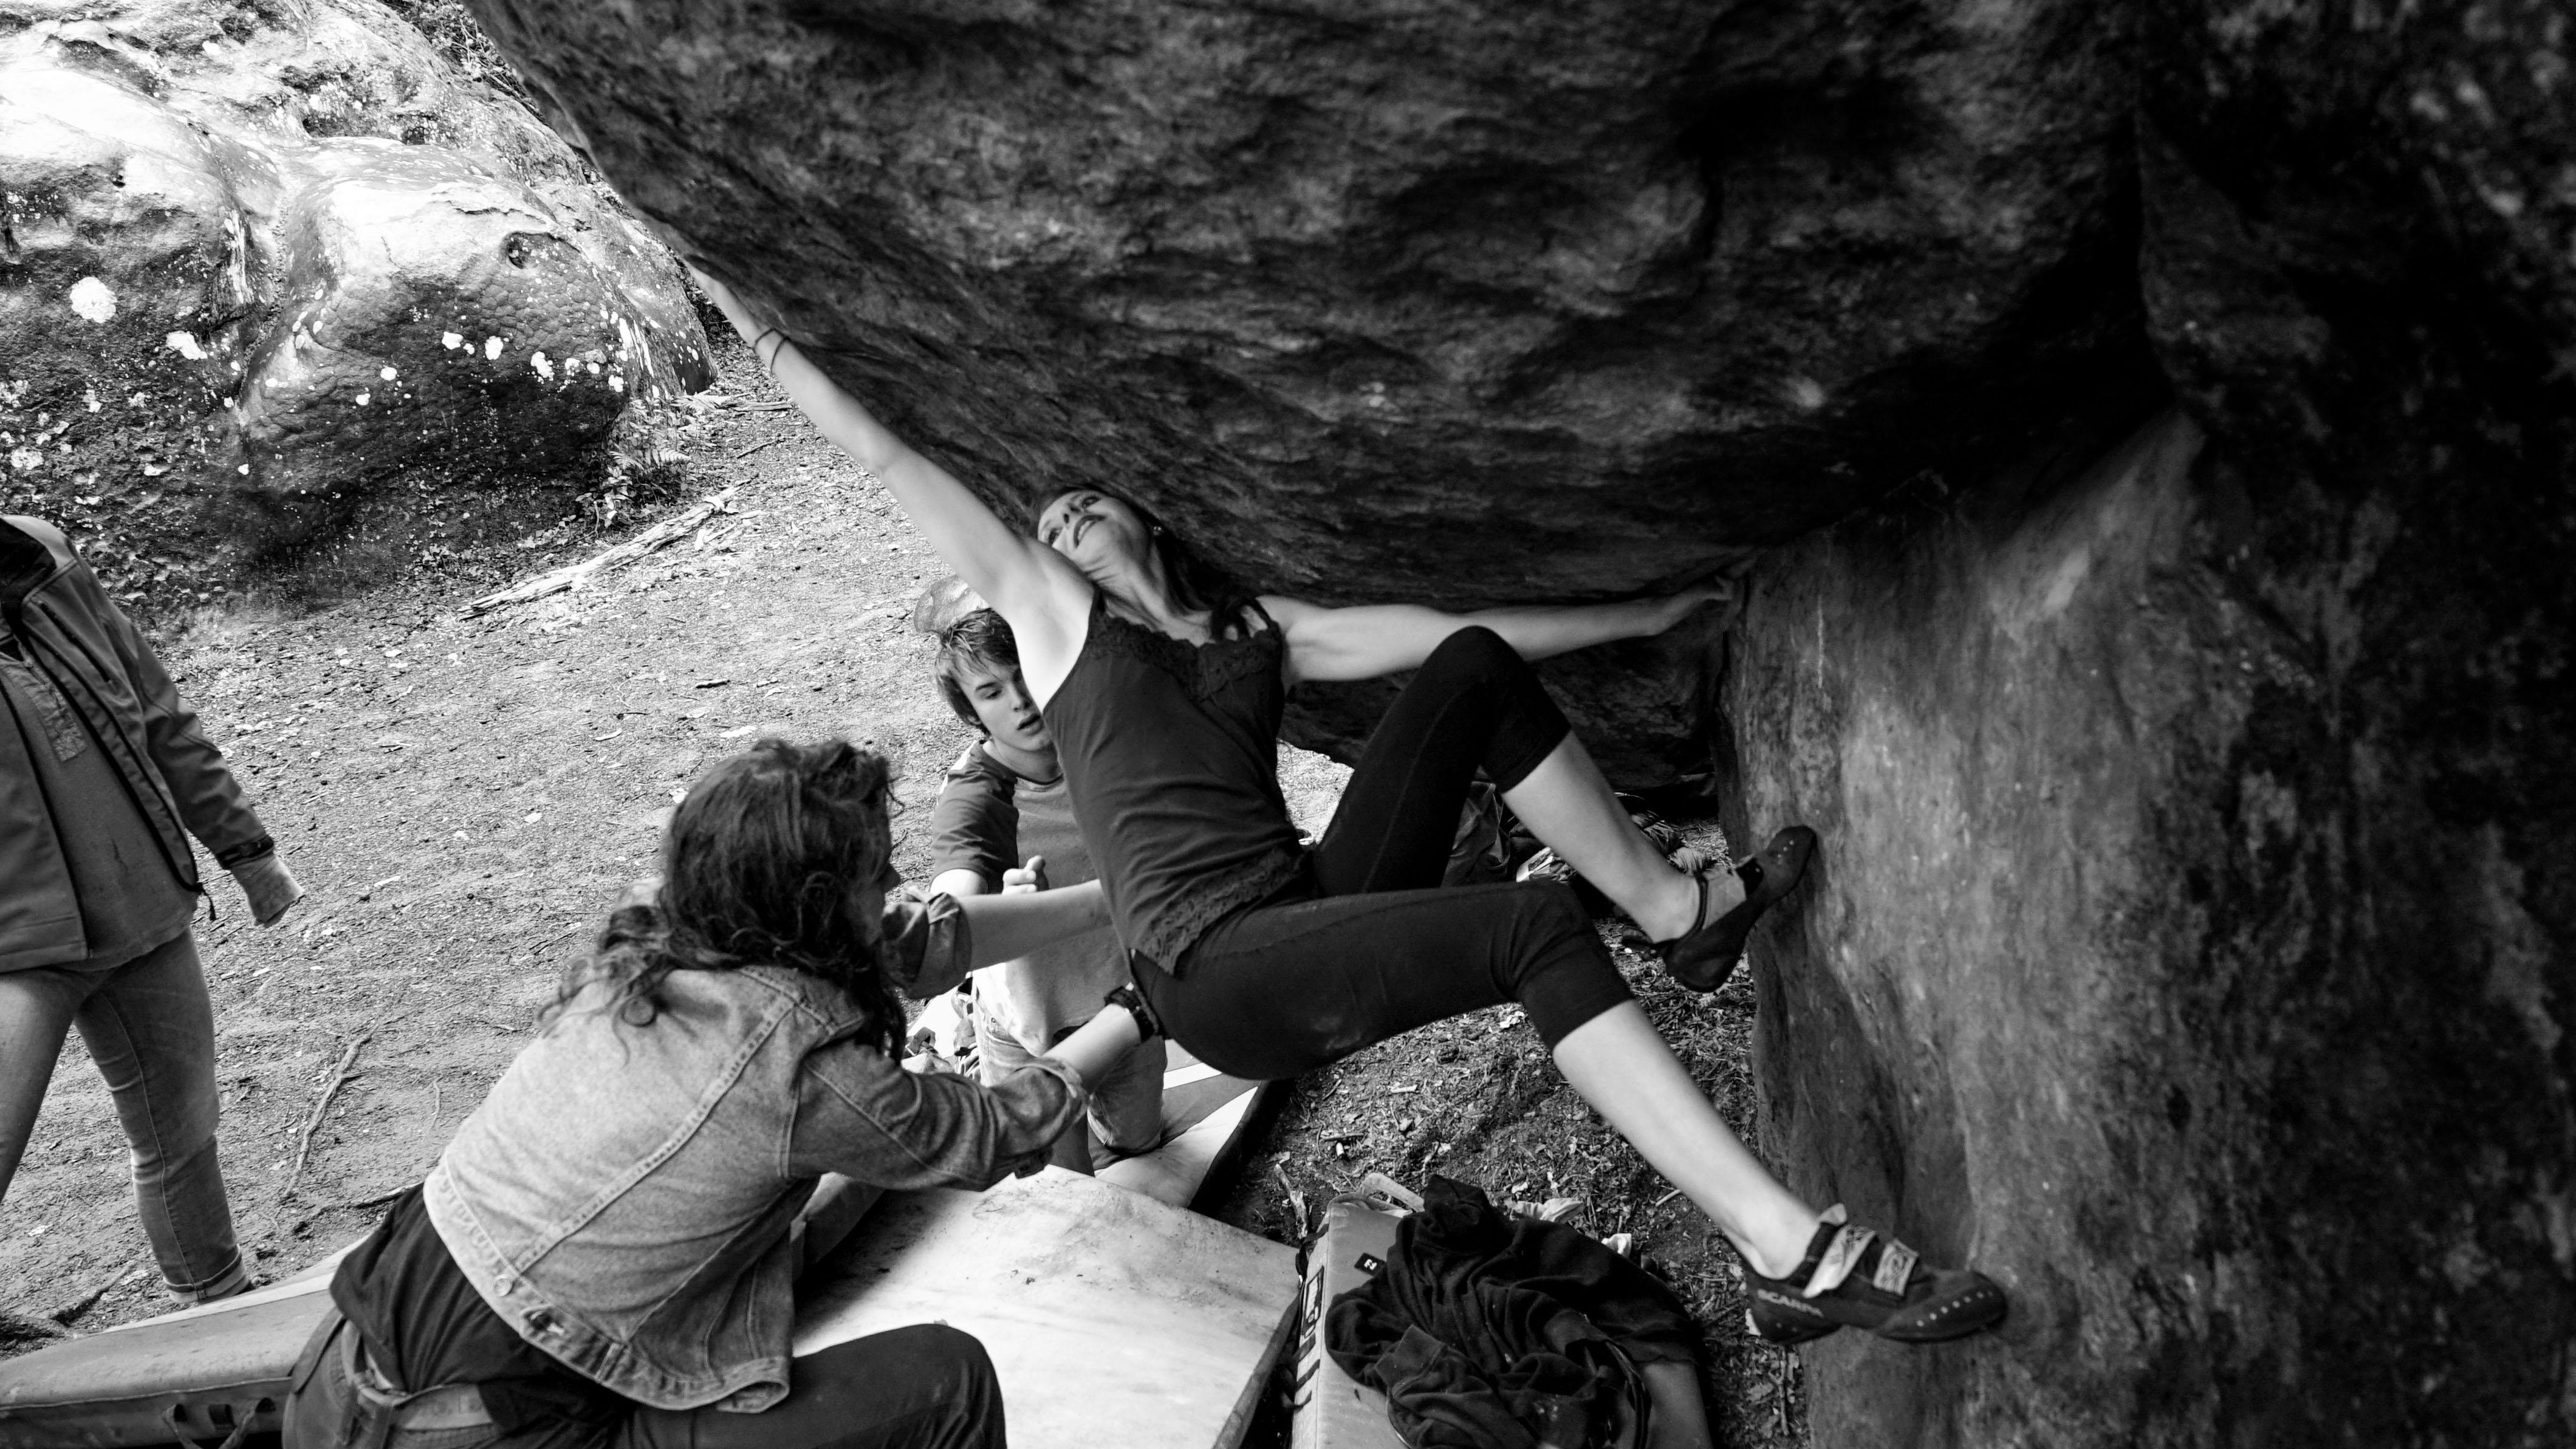 fontainbleau climbing 2016 mike brindley-11